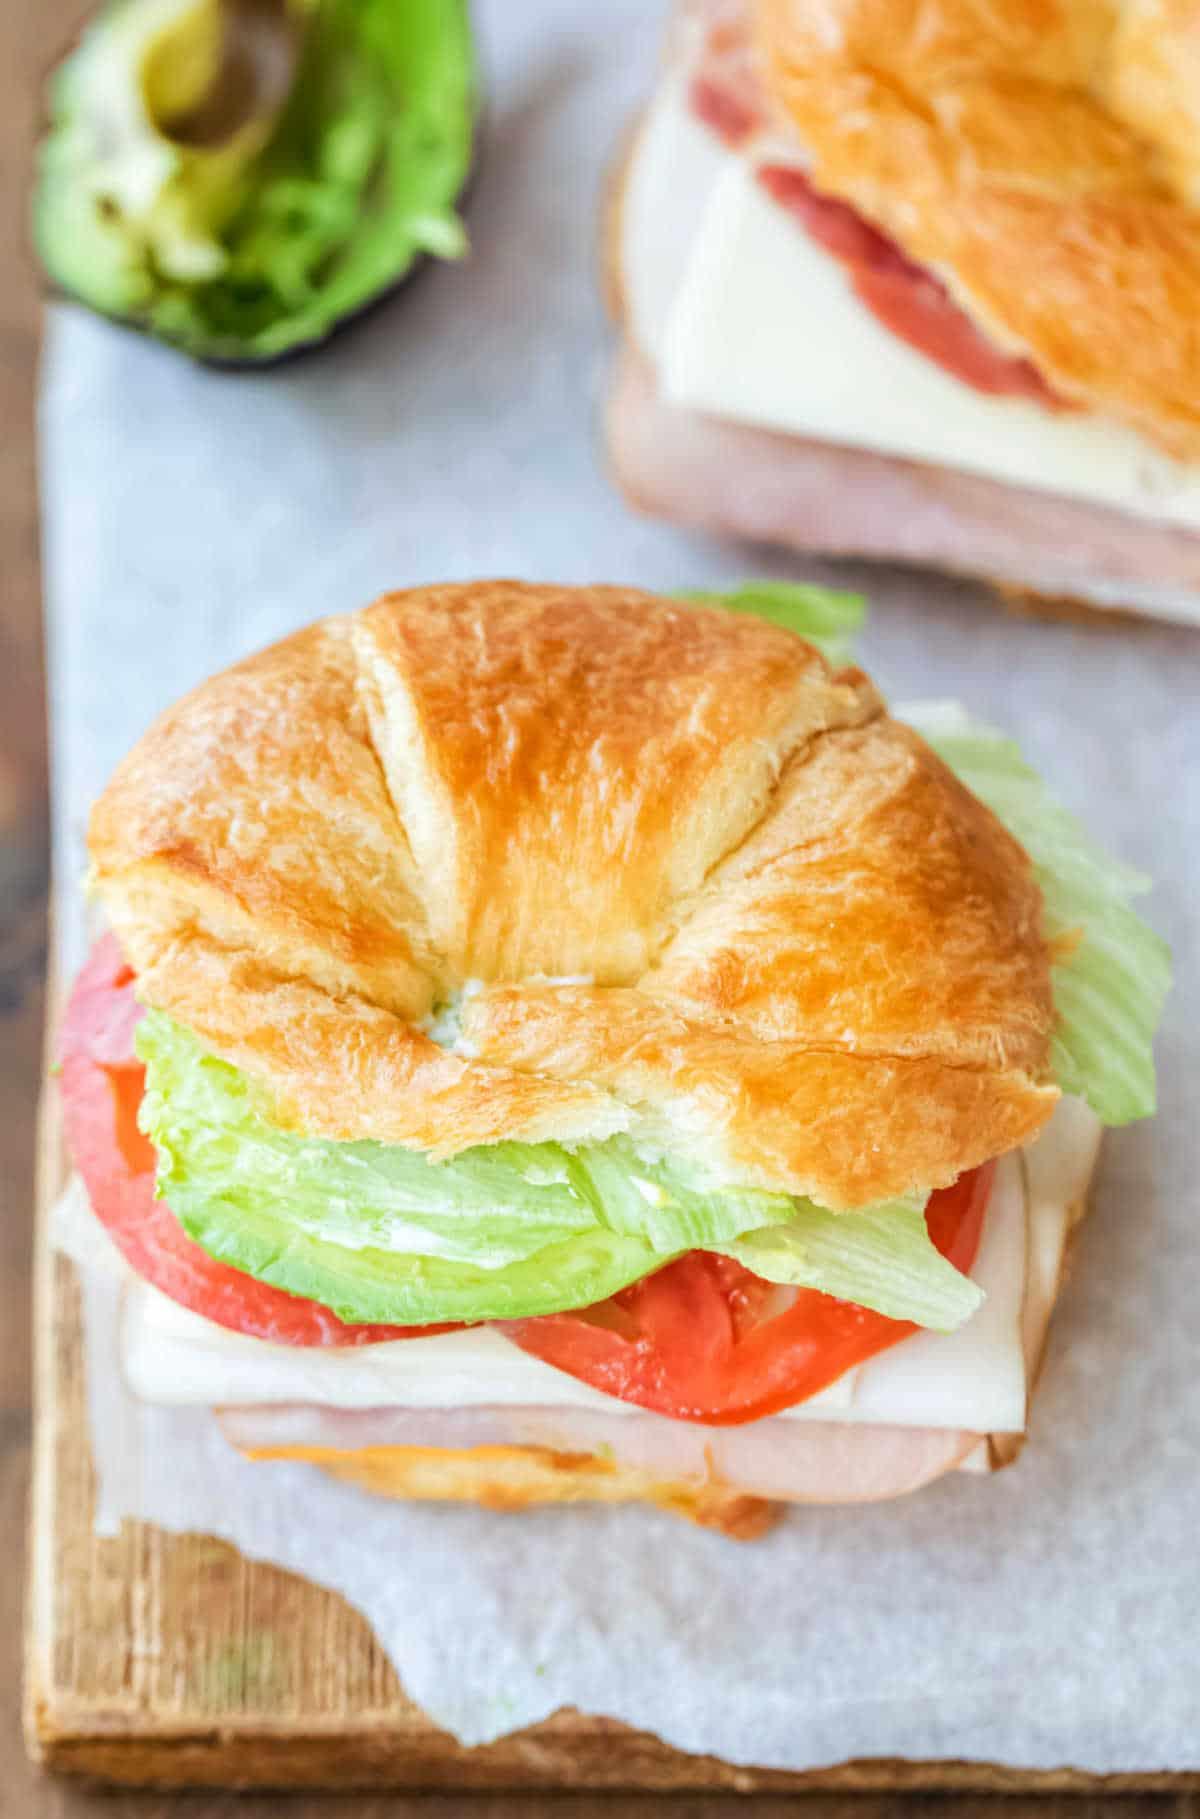 Overhead view of croissant sandwich on a piece of parchment paper.